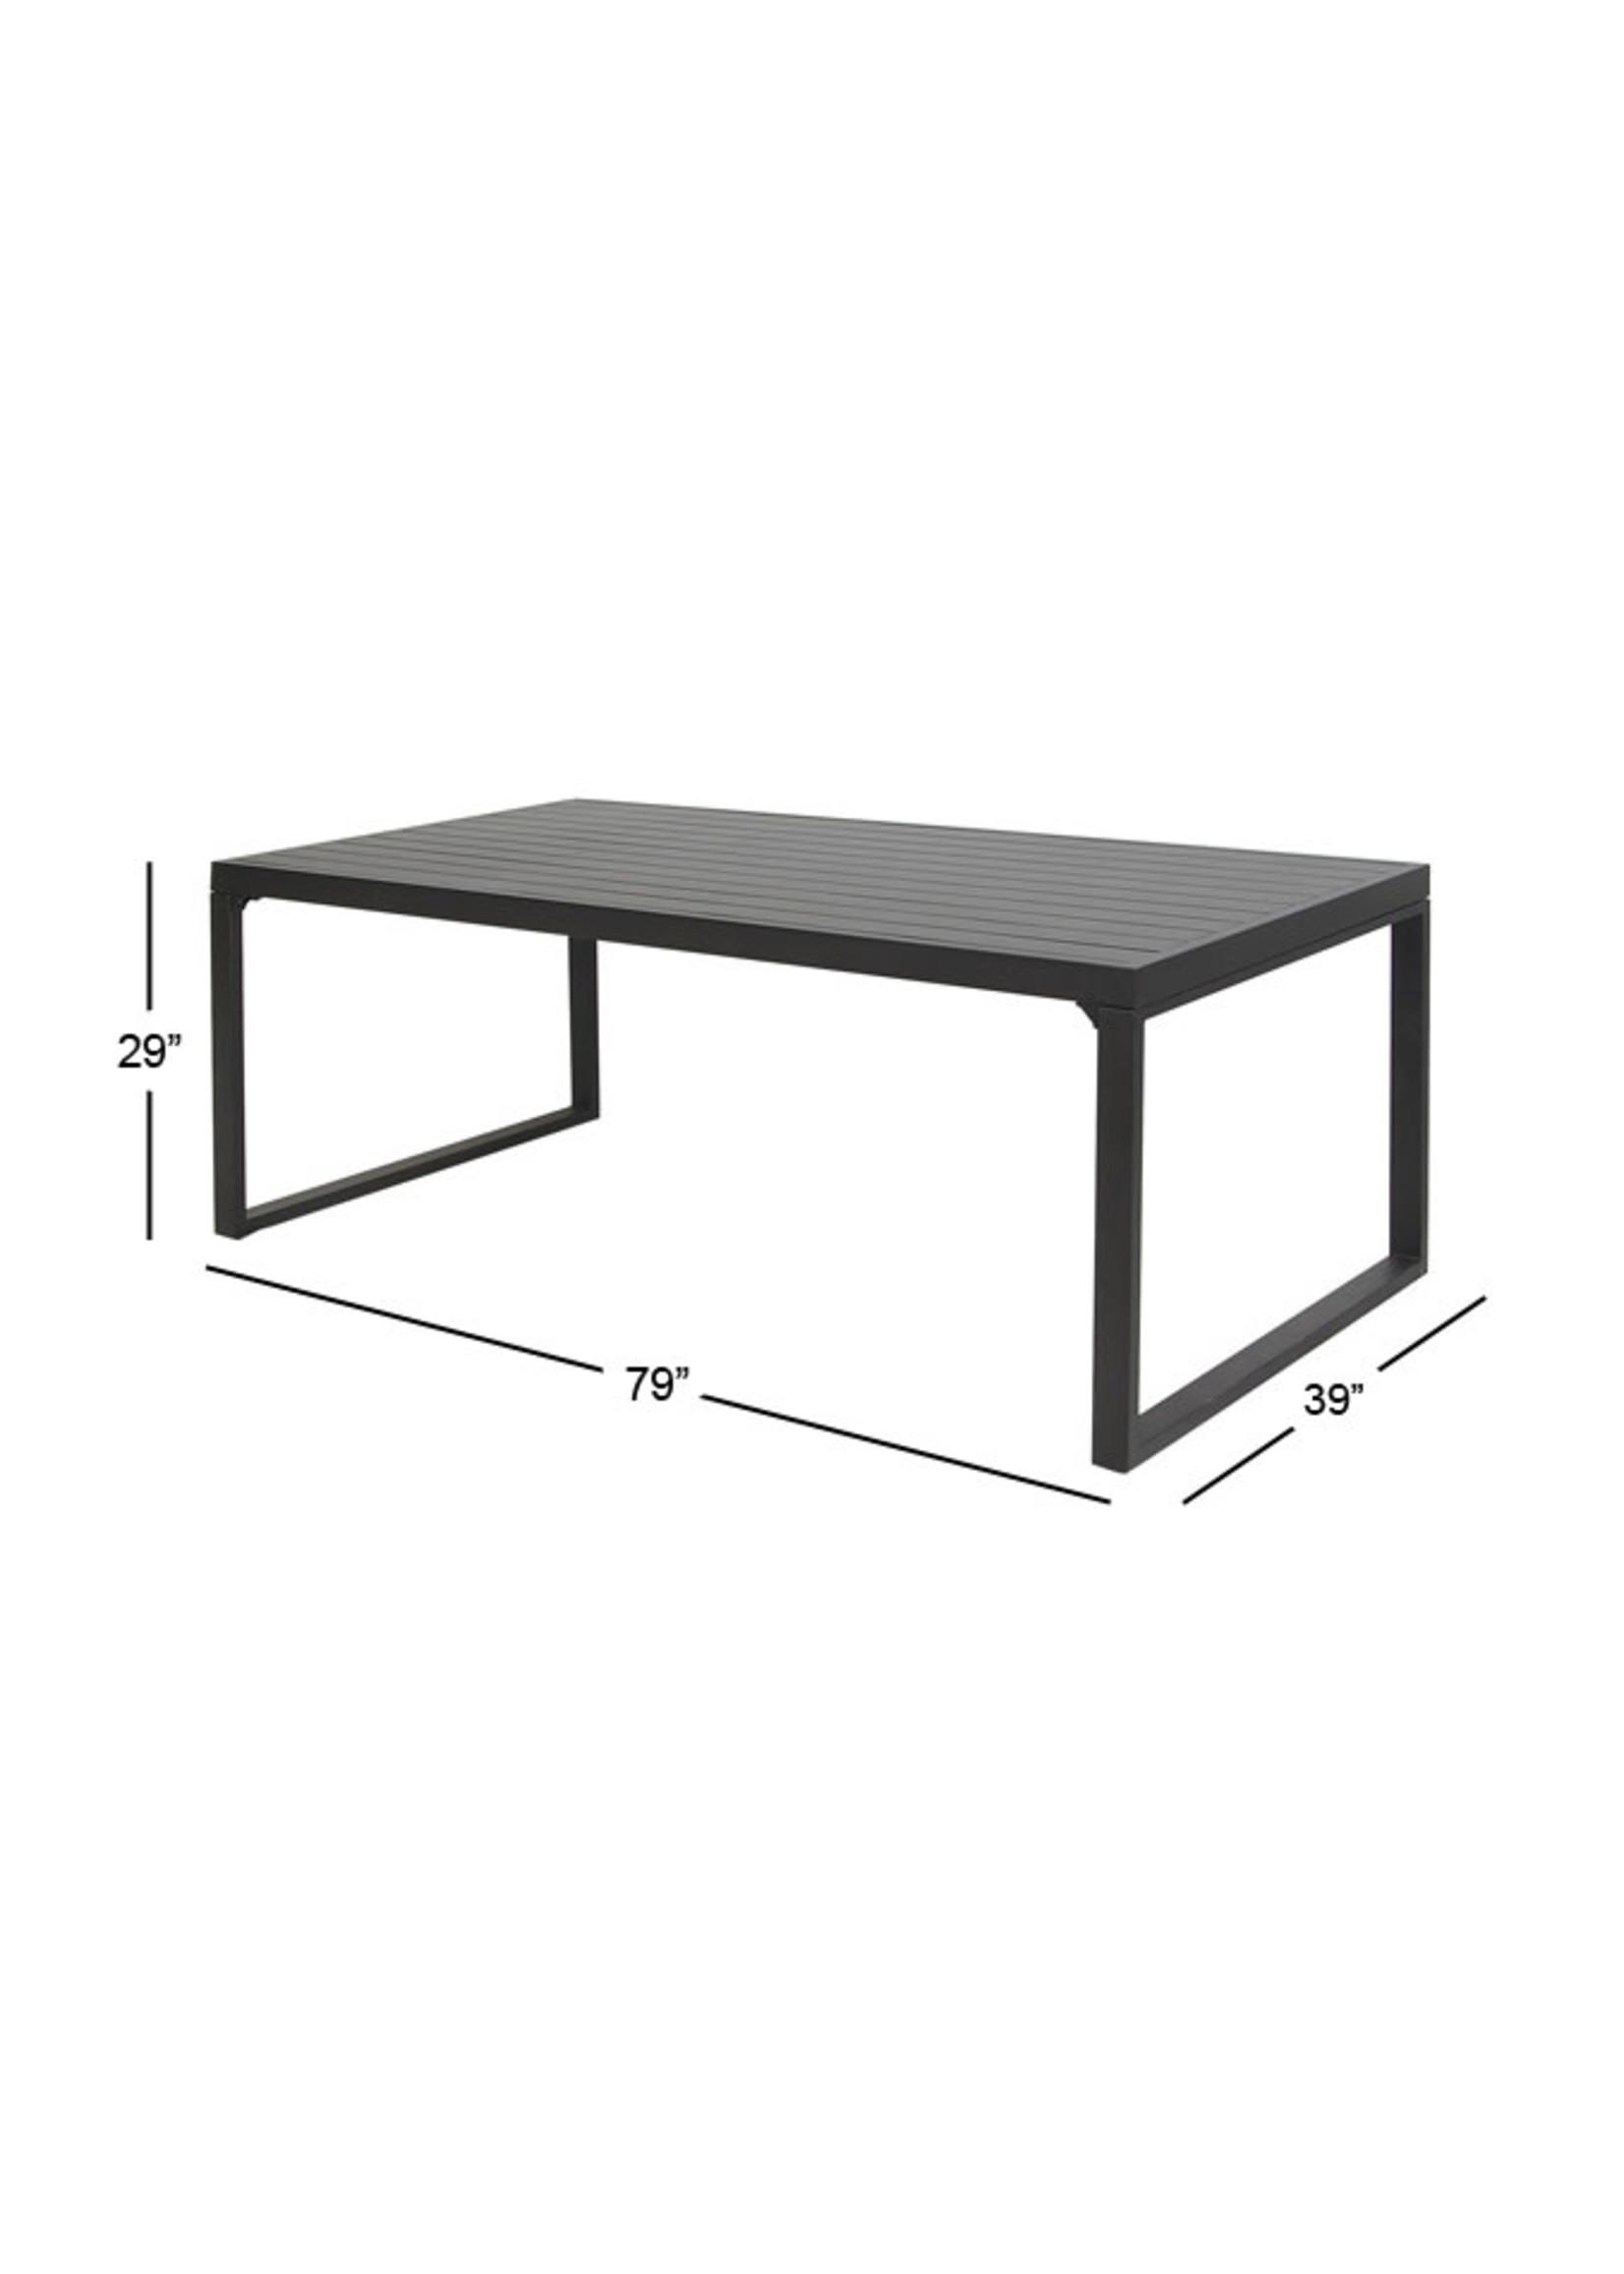 UMA Enterprises UMA Aluminum Dining Table & 6 Chairs w/Cover